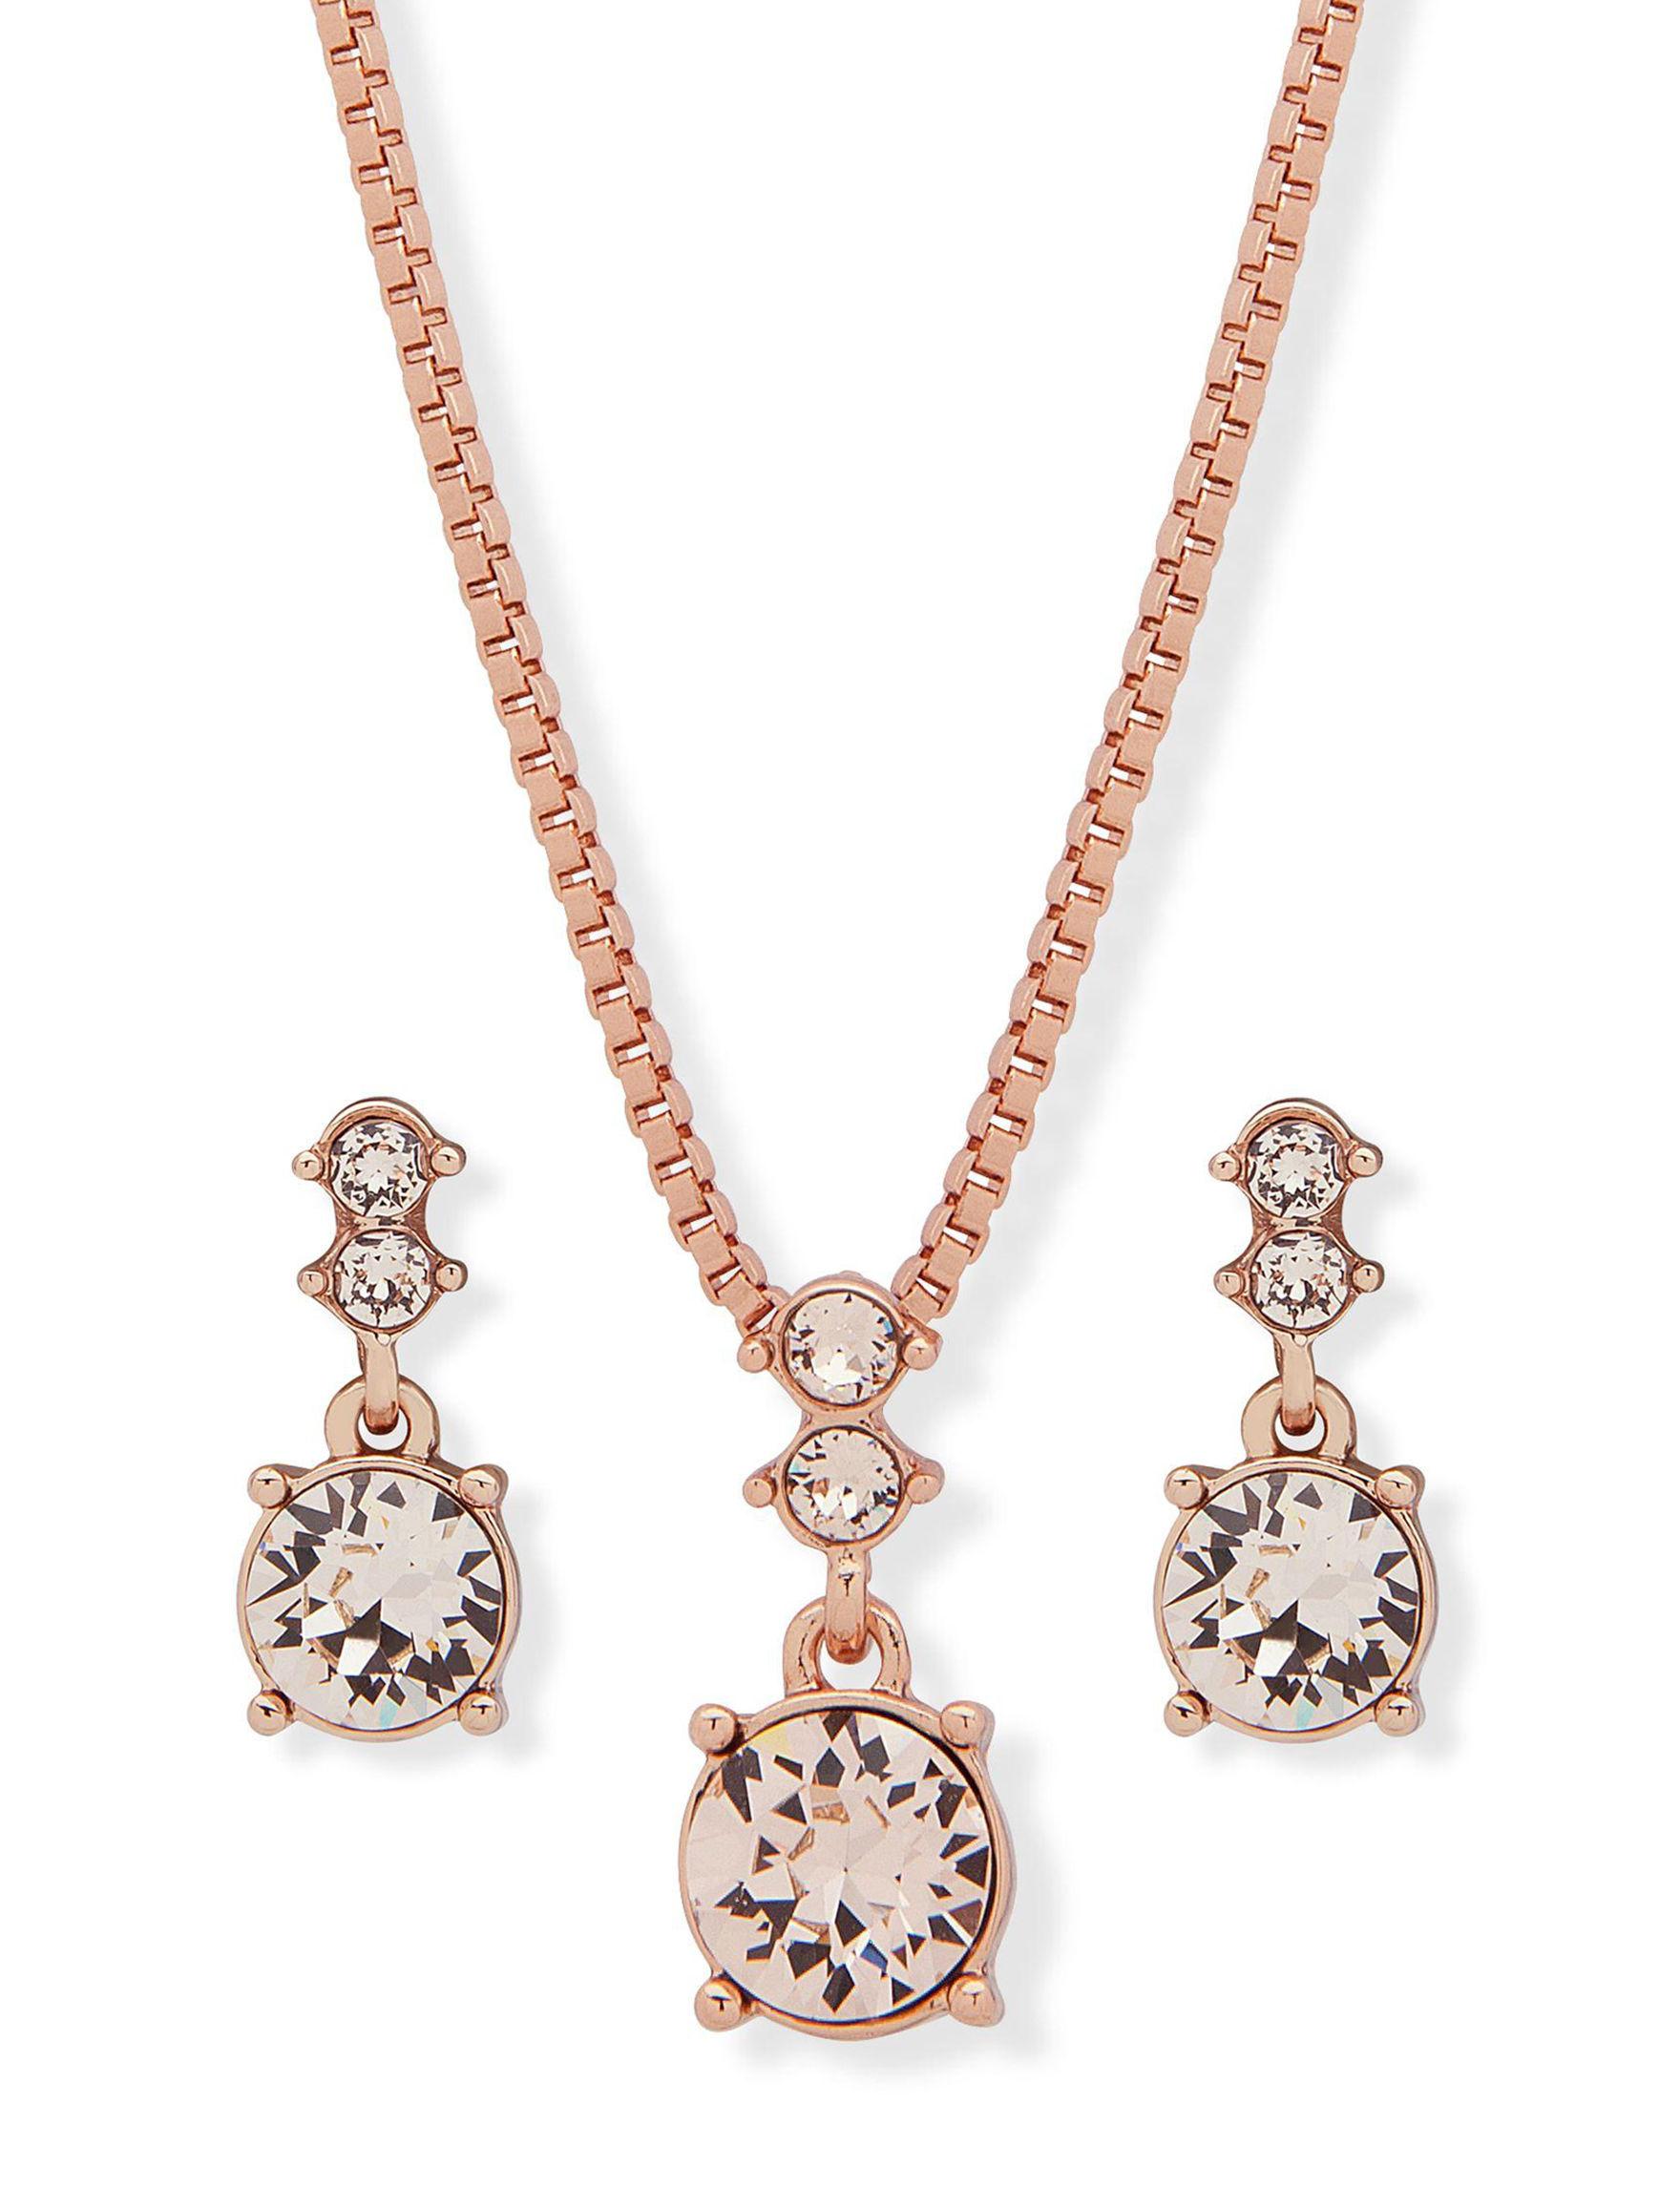 Gloria Vanderbilt Rose Gold / Pink Drops Earrings Necklaces & Pendants Fashion Jewelry